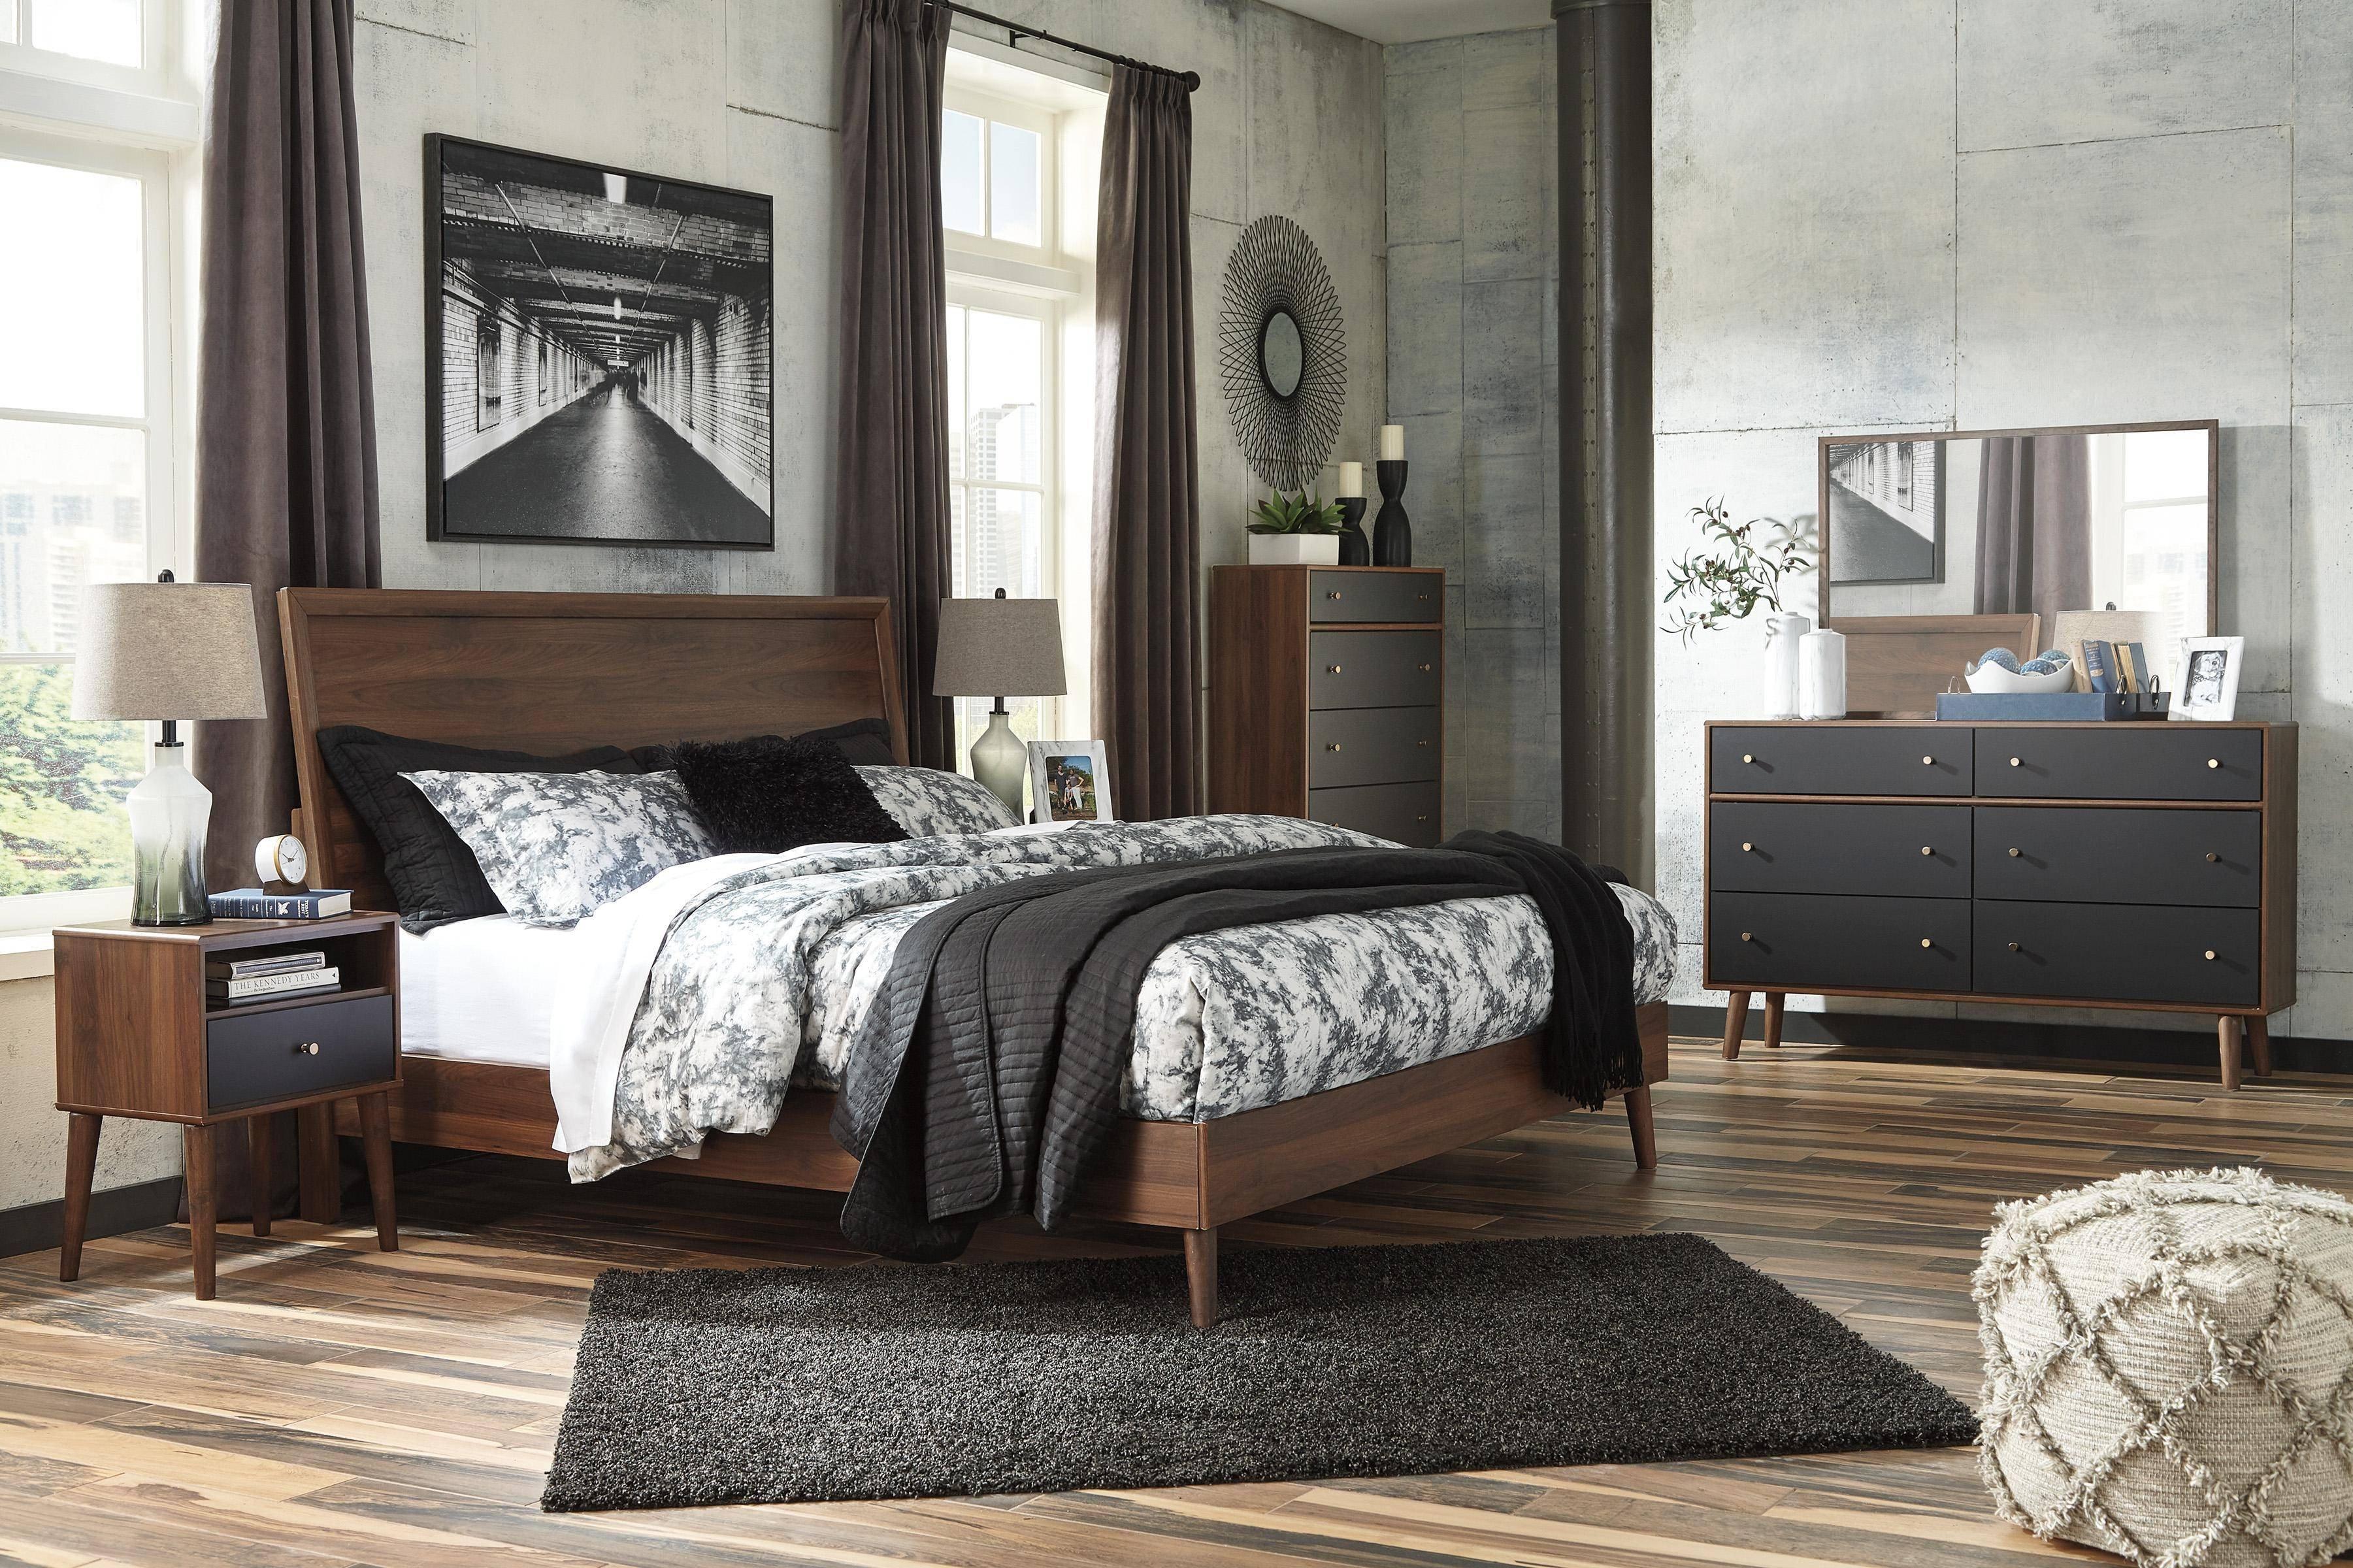 Ashley Black Bedroom Set Elegant ashley Daneston B292 King Size Panel Bedroom Set 6pcs In